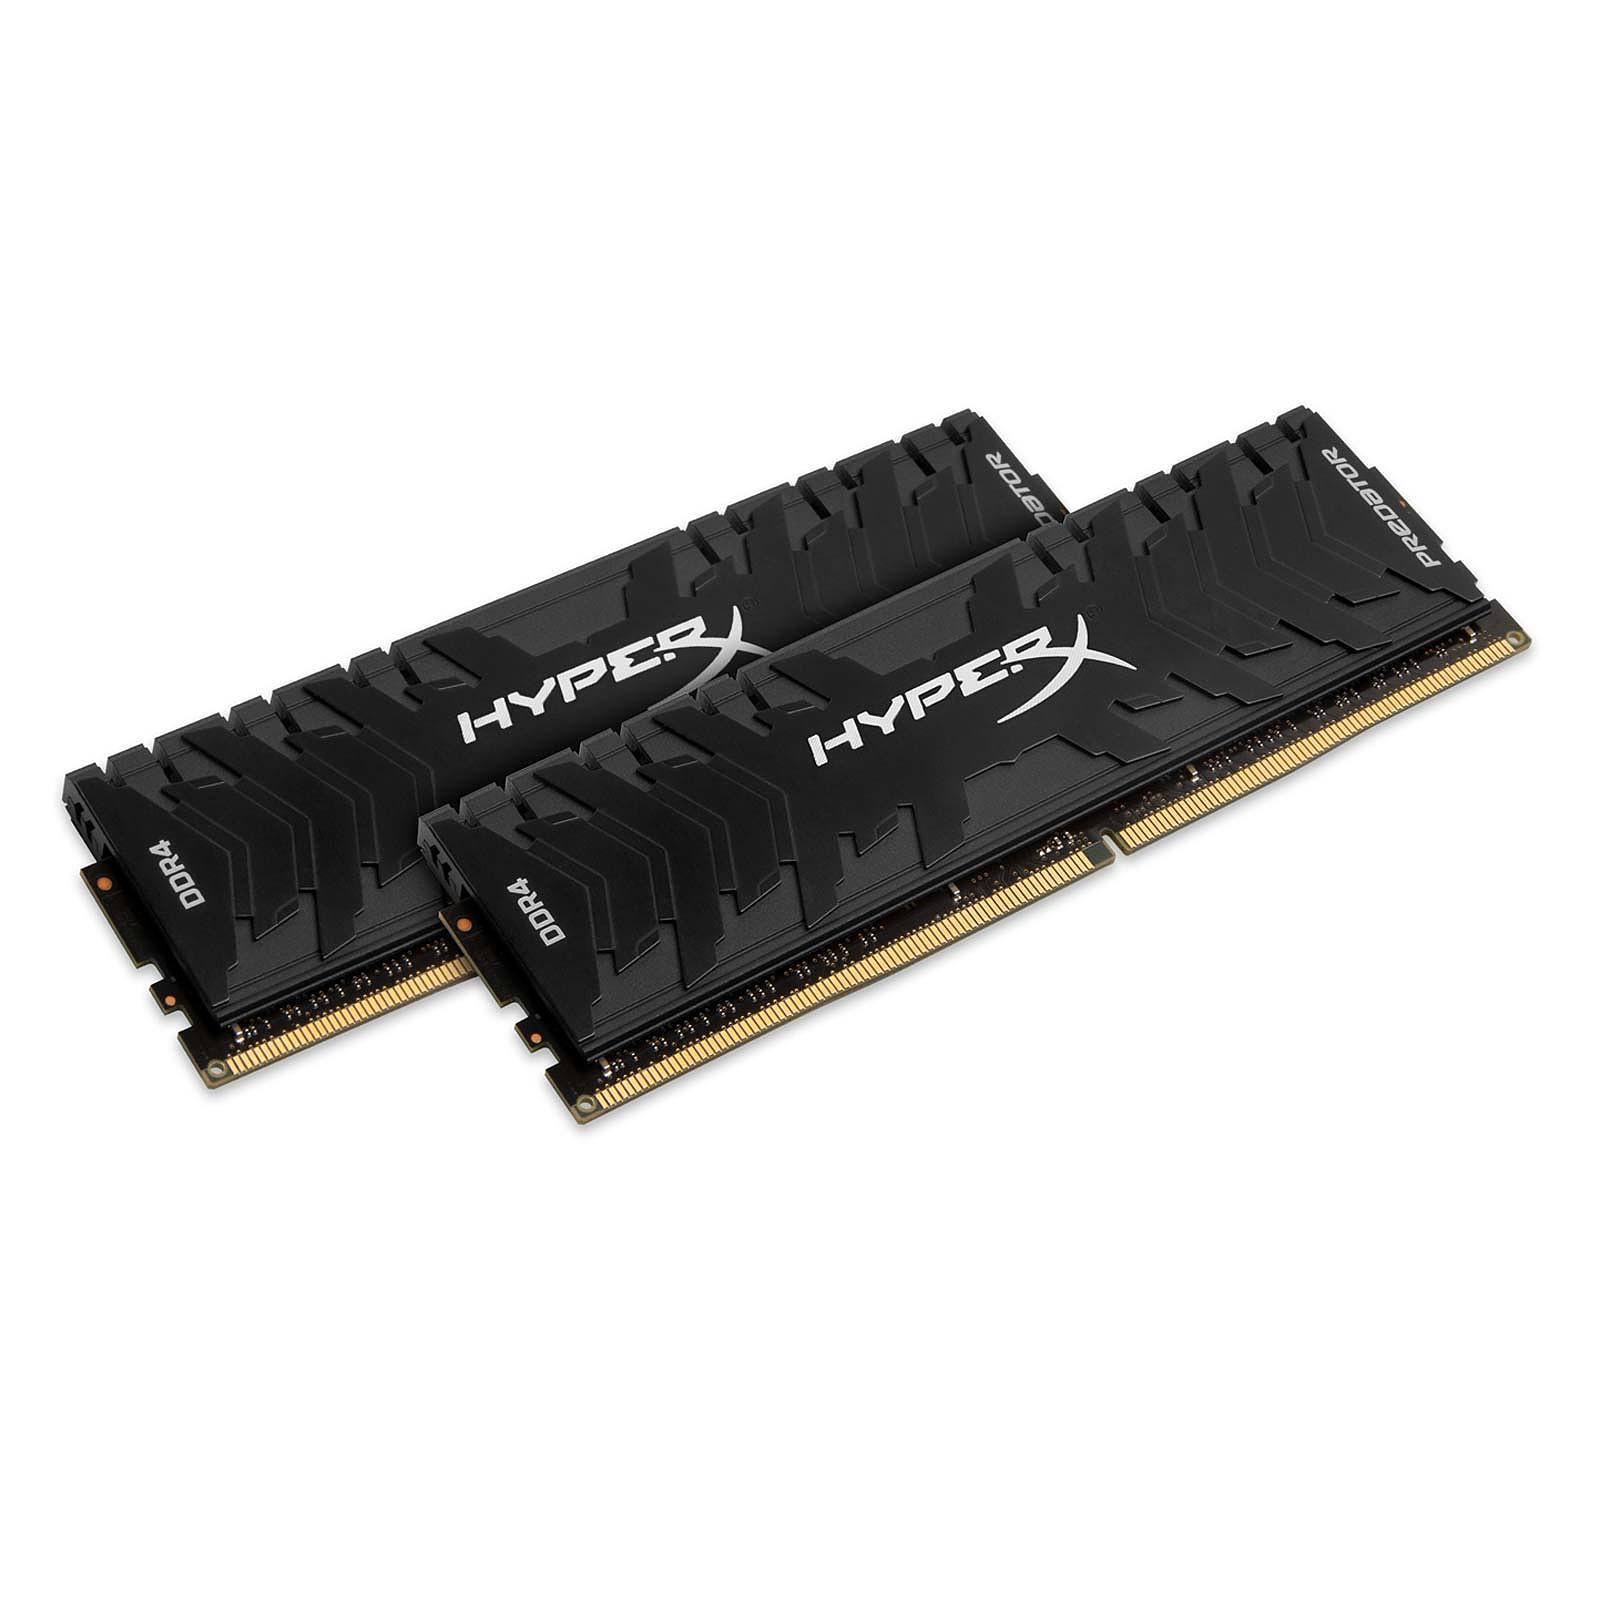 HyperX Predator Noir 16 Go (2x 8 Go) DDR4 4000 MHz CL19